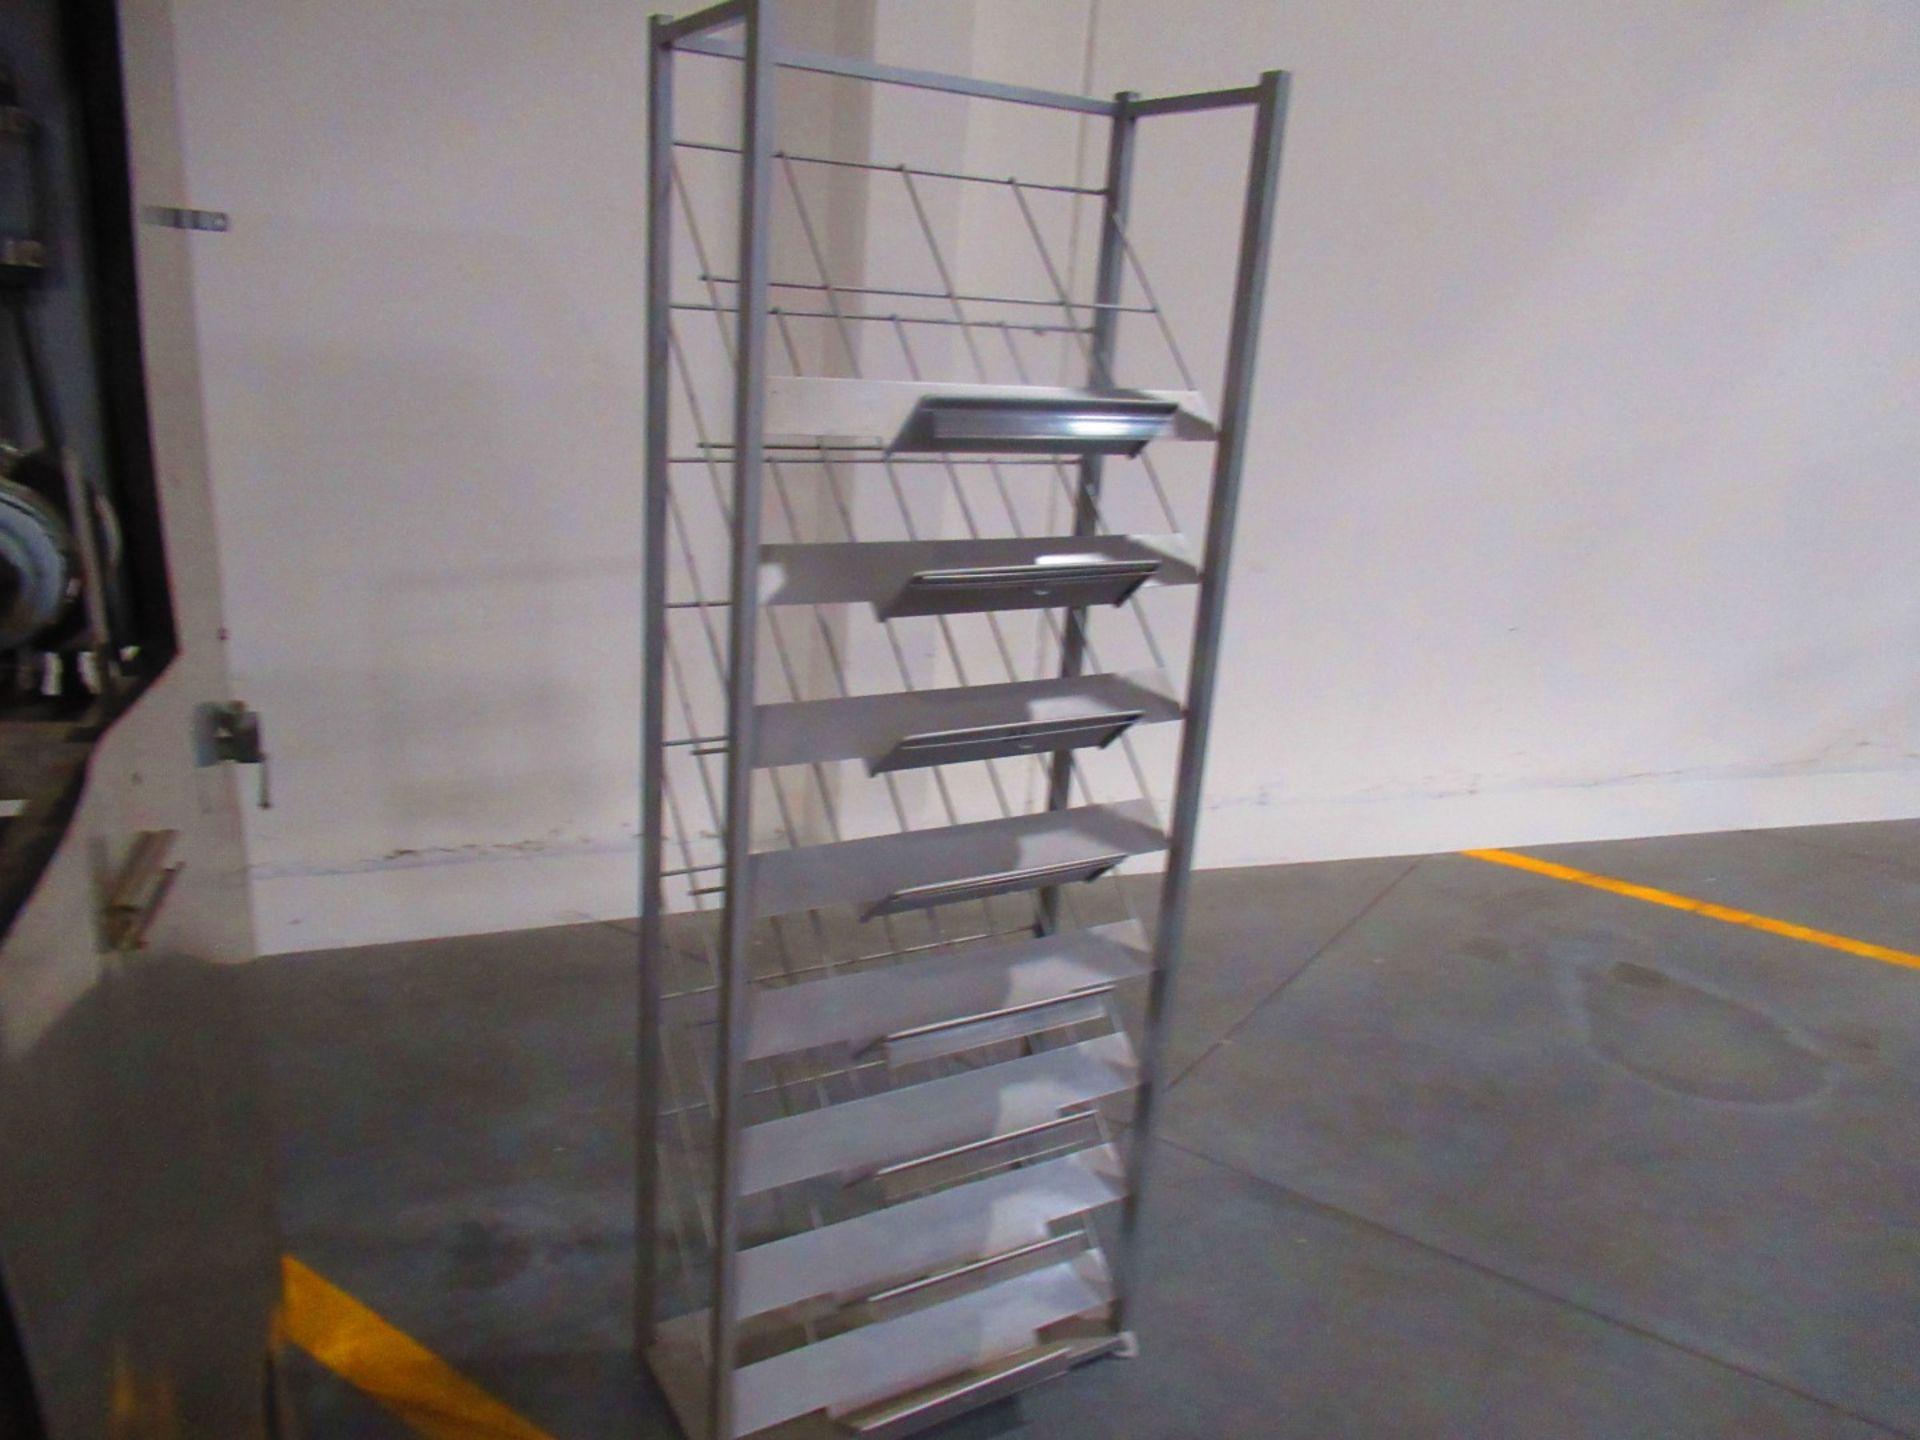 Display rack - Image 2 of 2